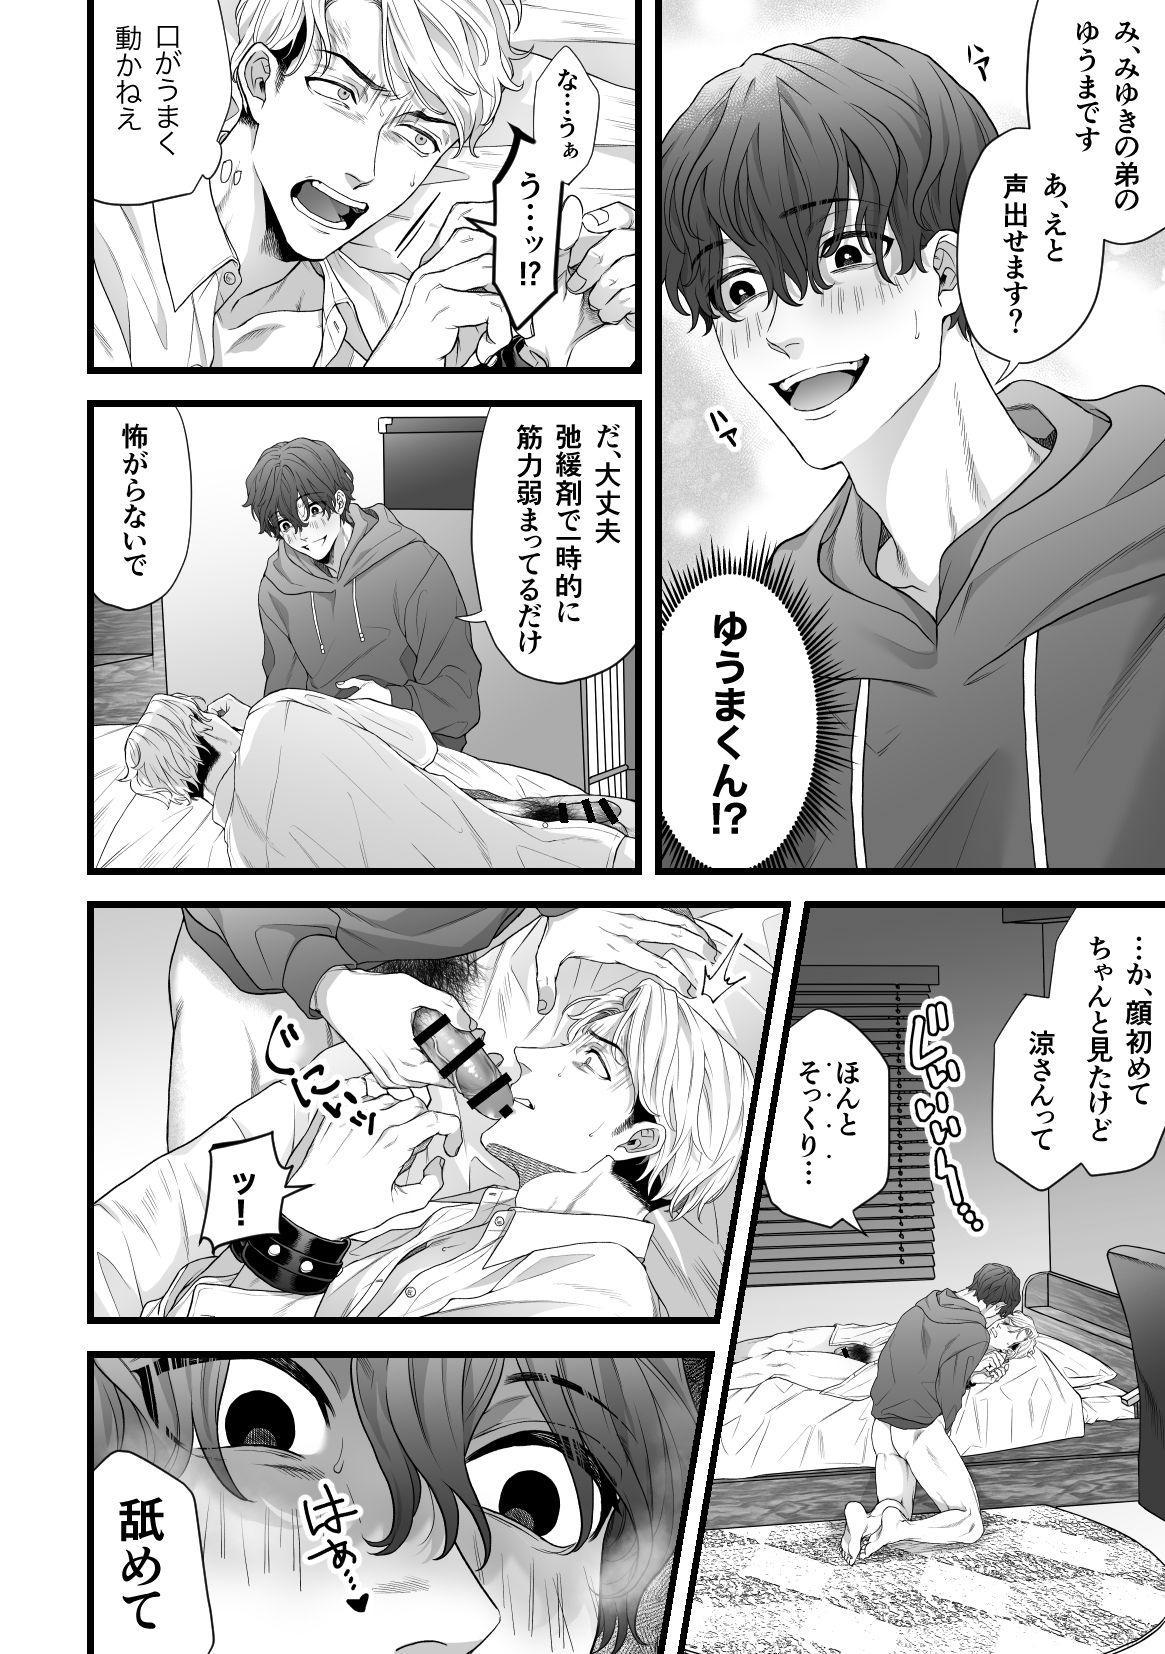 Gikei Ryoujoku 9